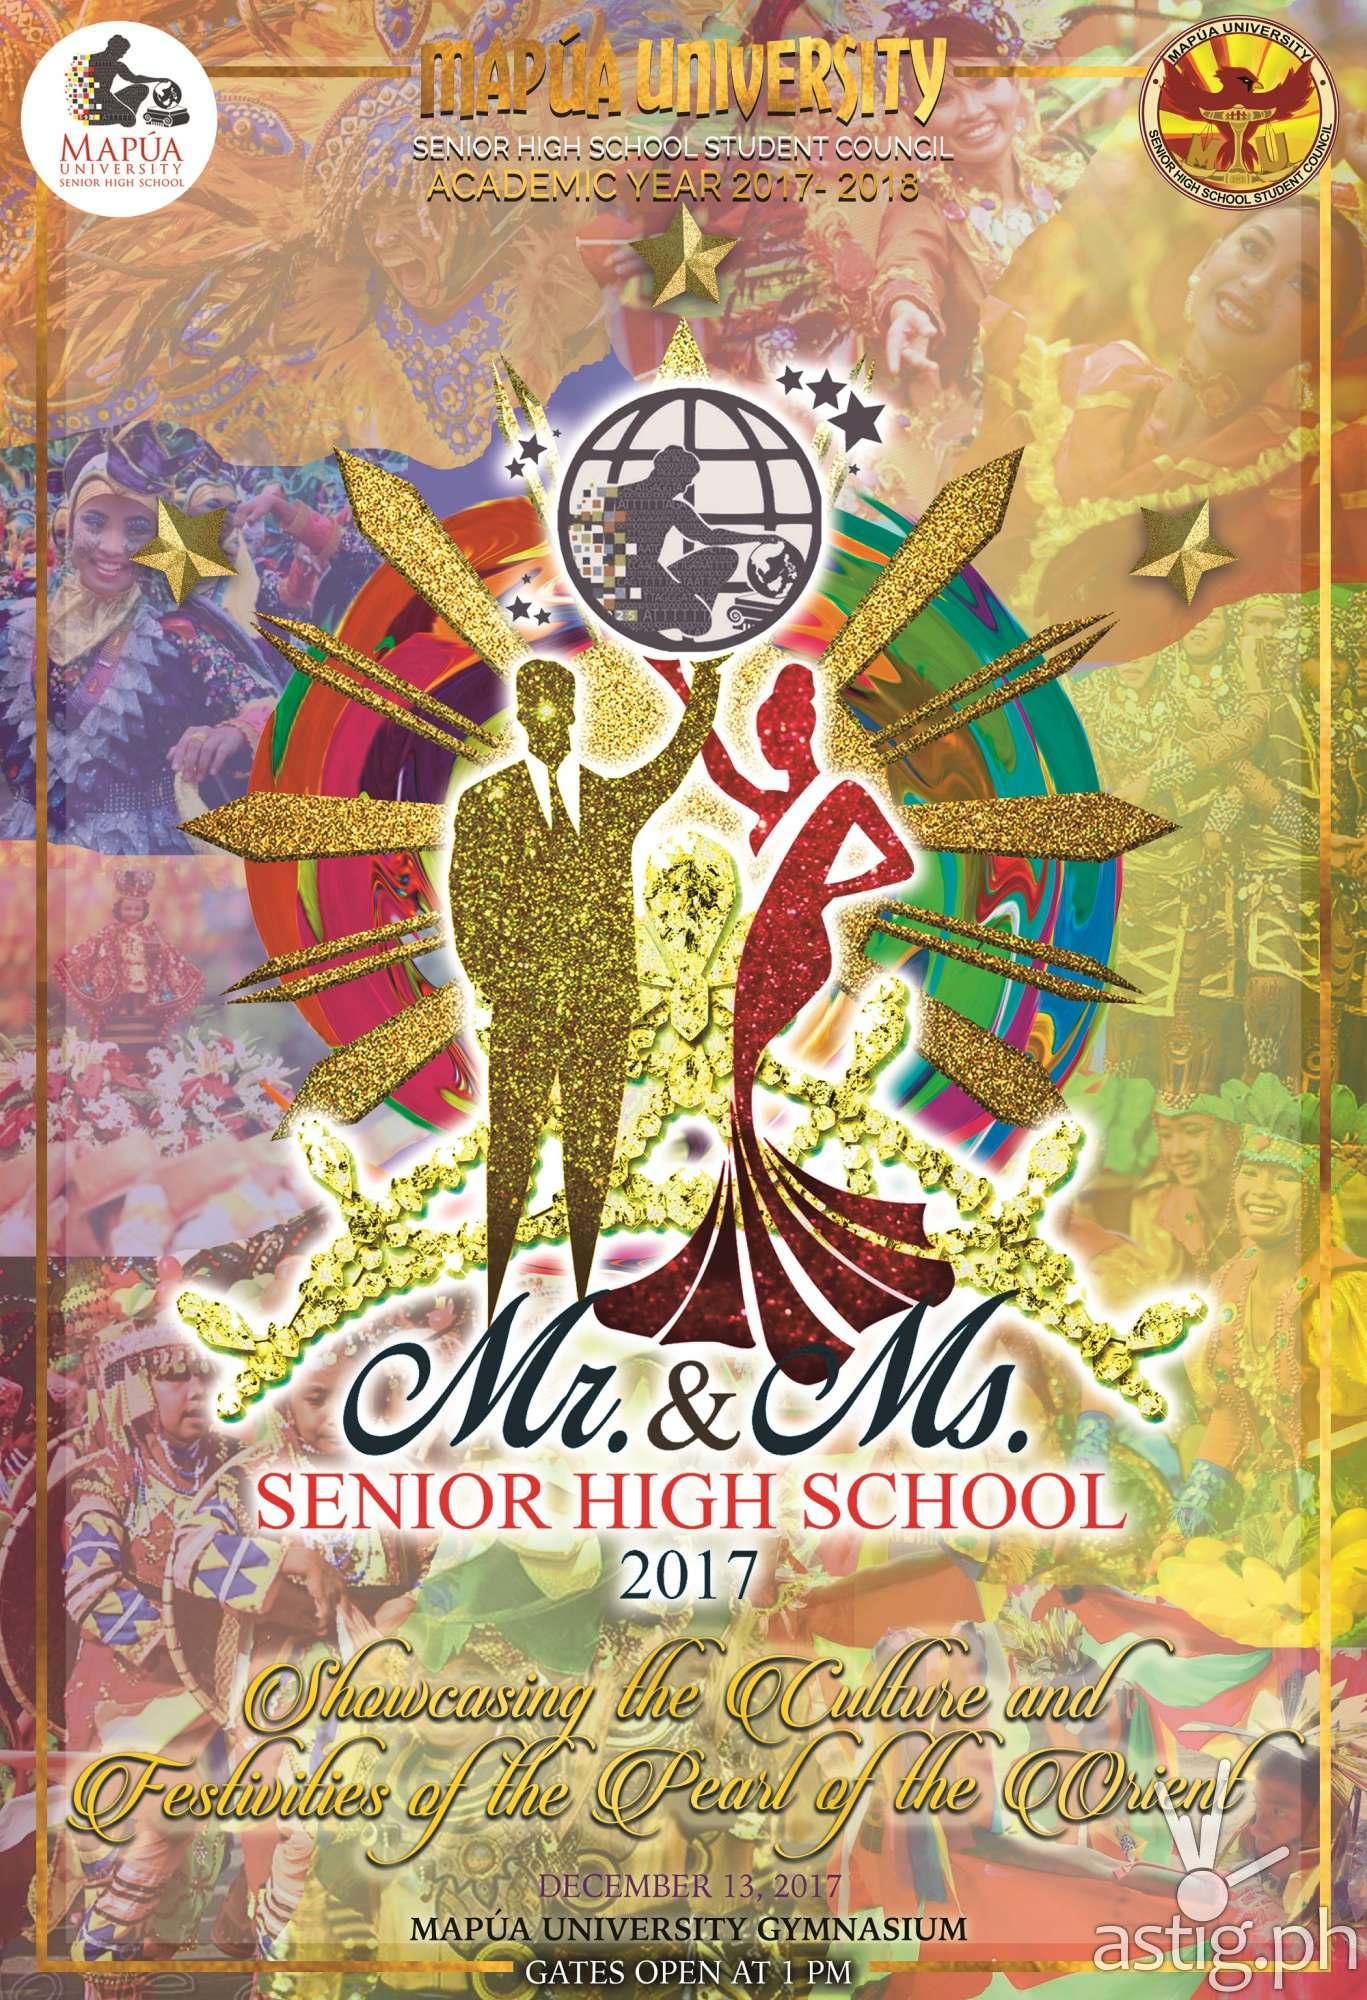 Mapúa University Mr. and Ms. Senior High School event poster